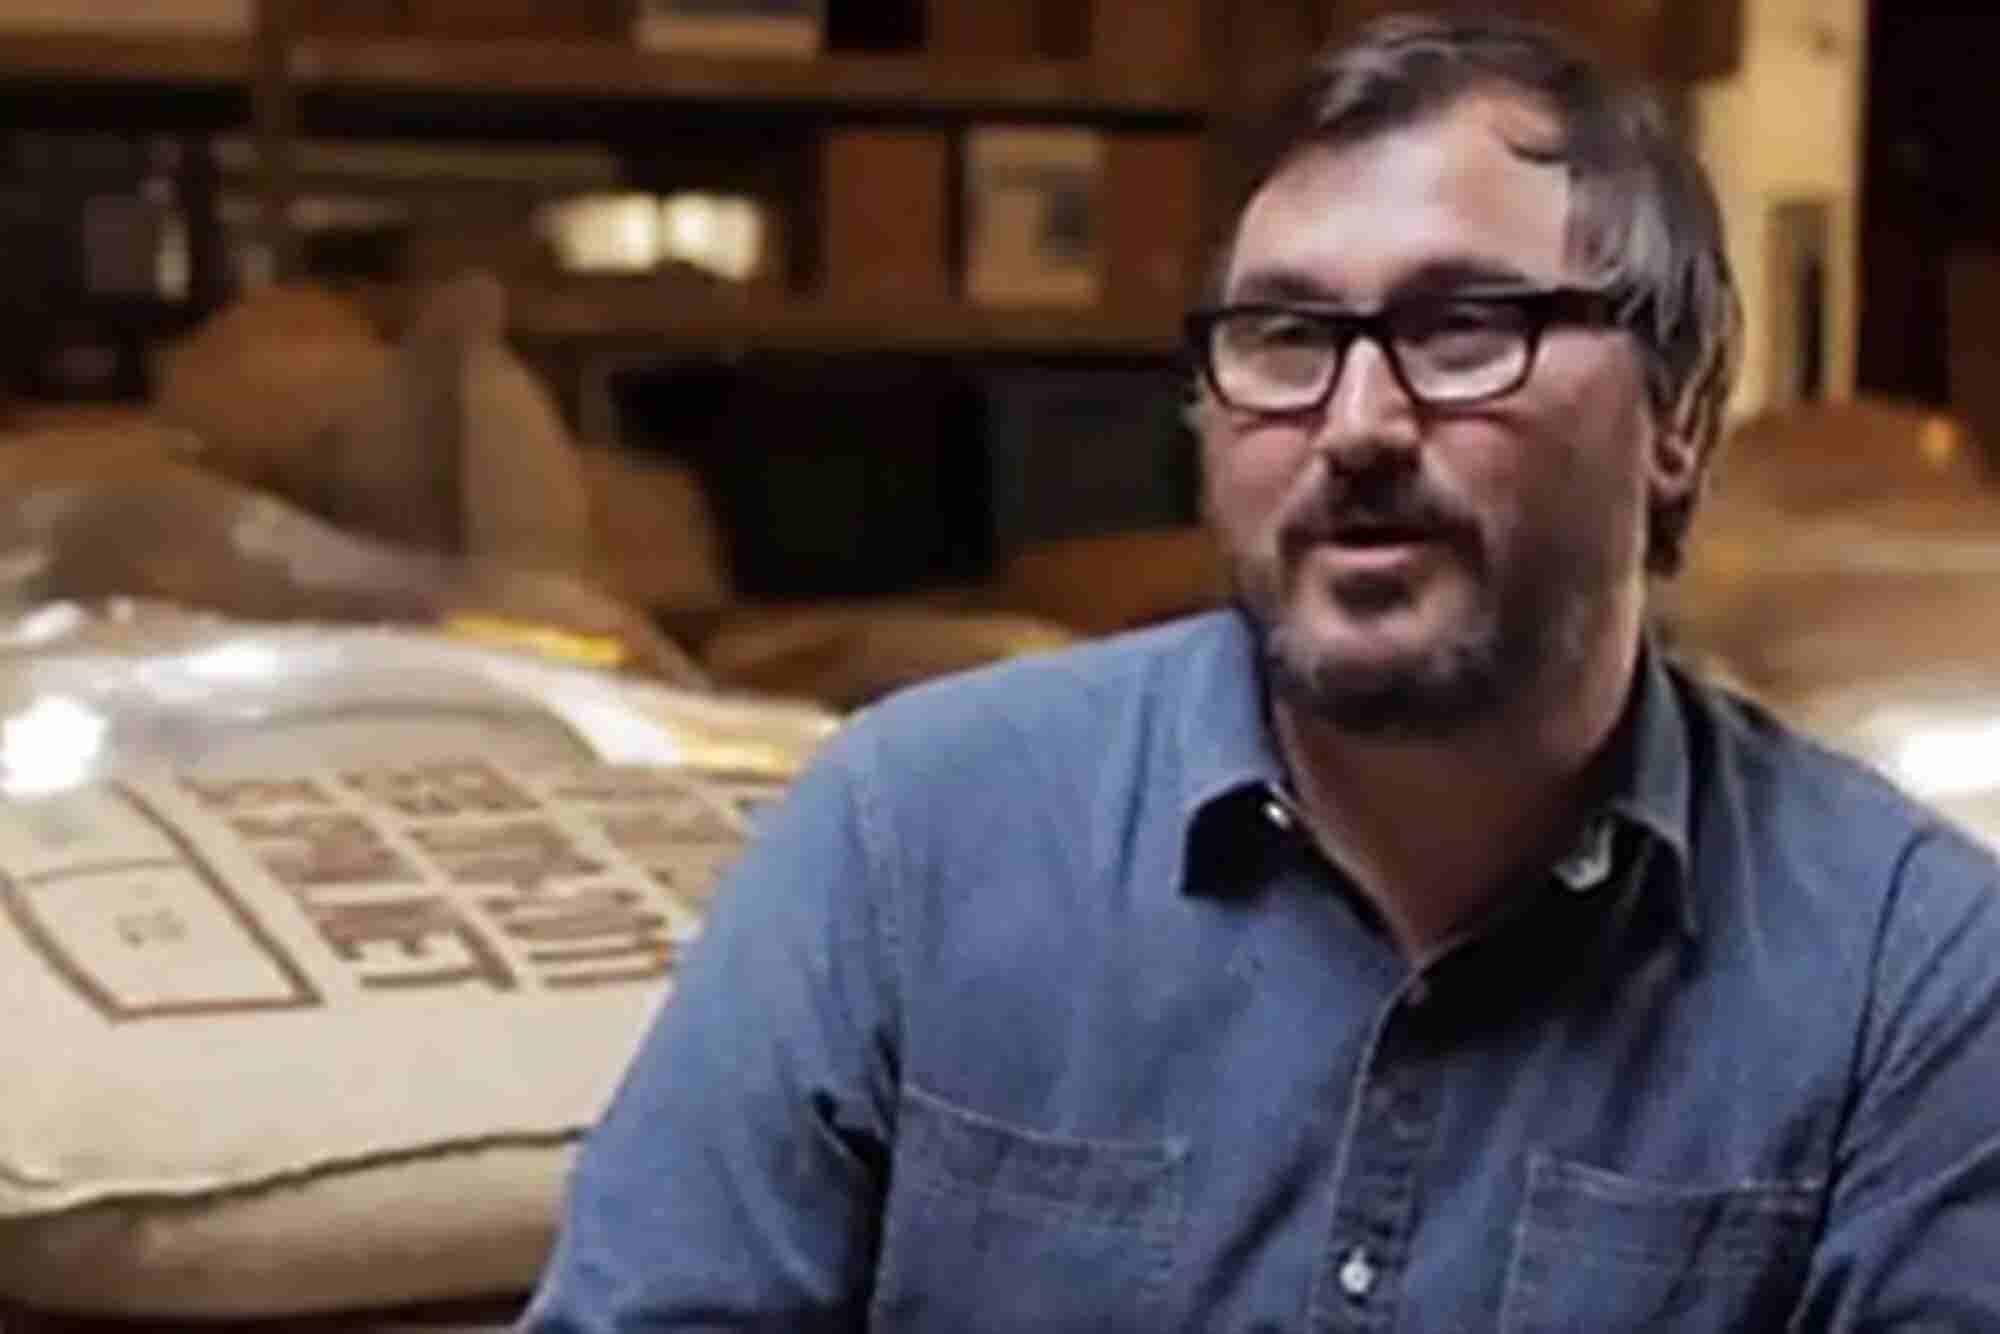 The Innovators: Stumptown's Duane Sorenson